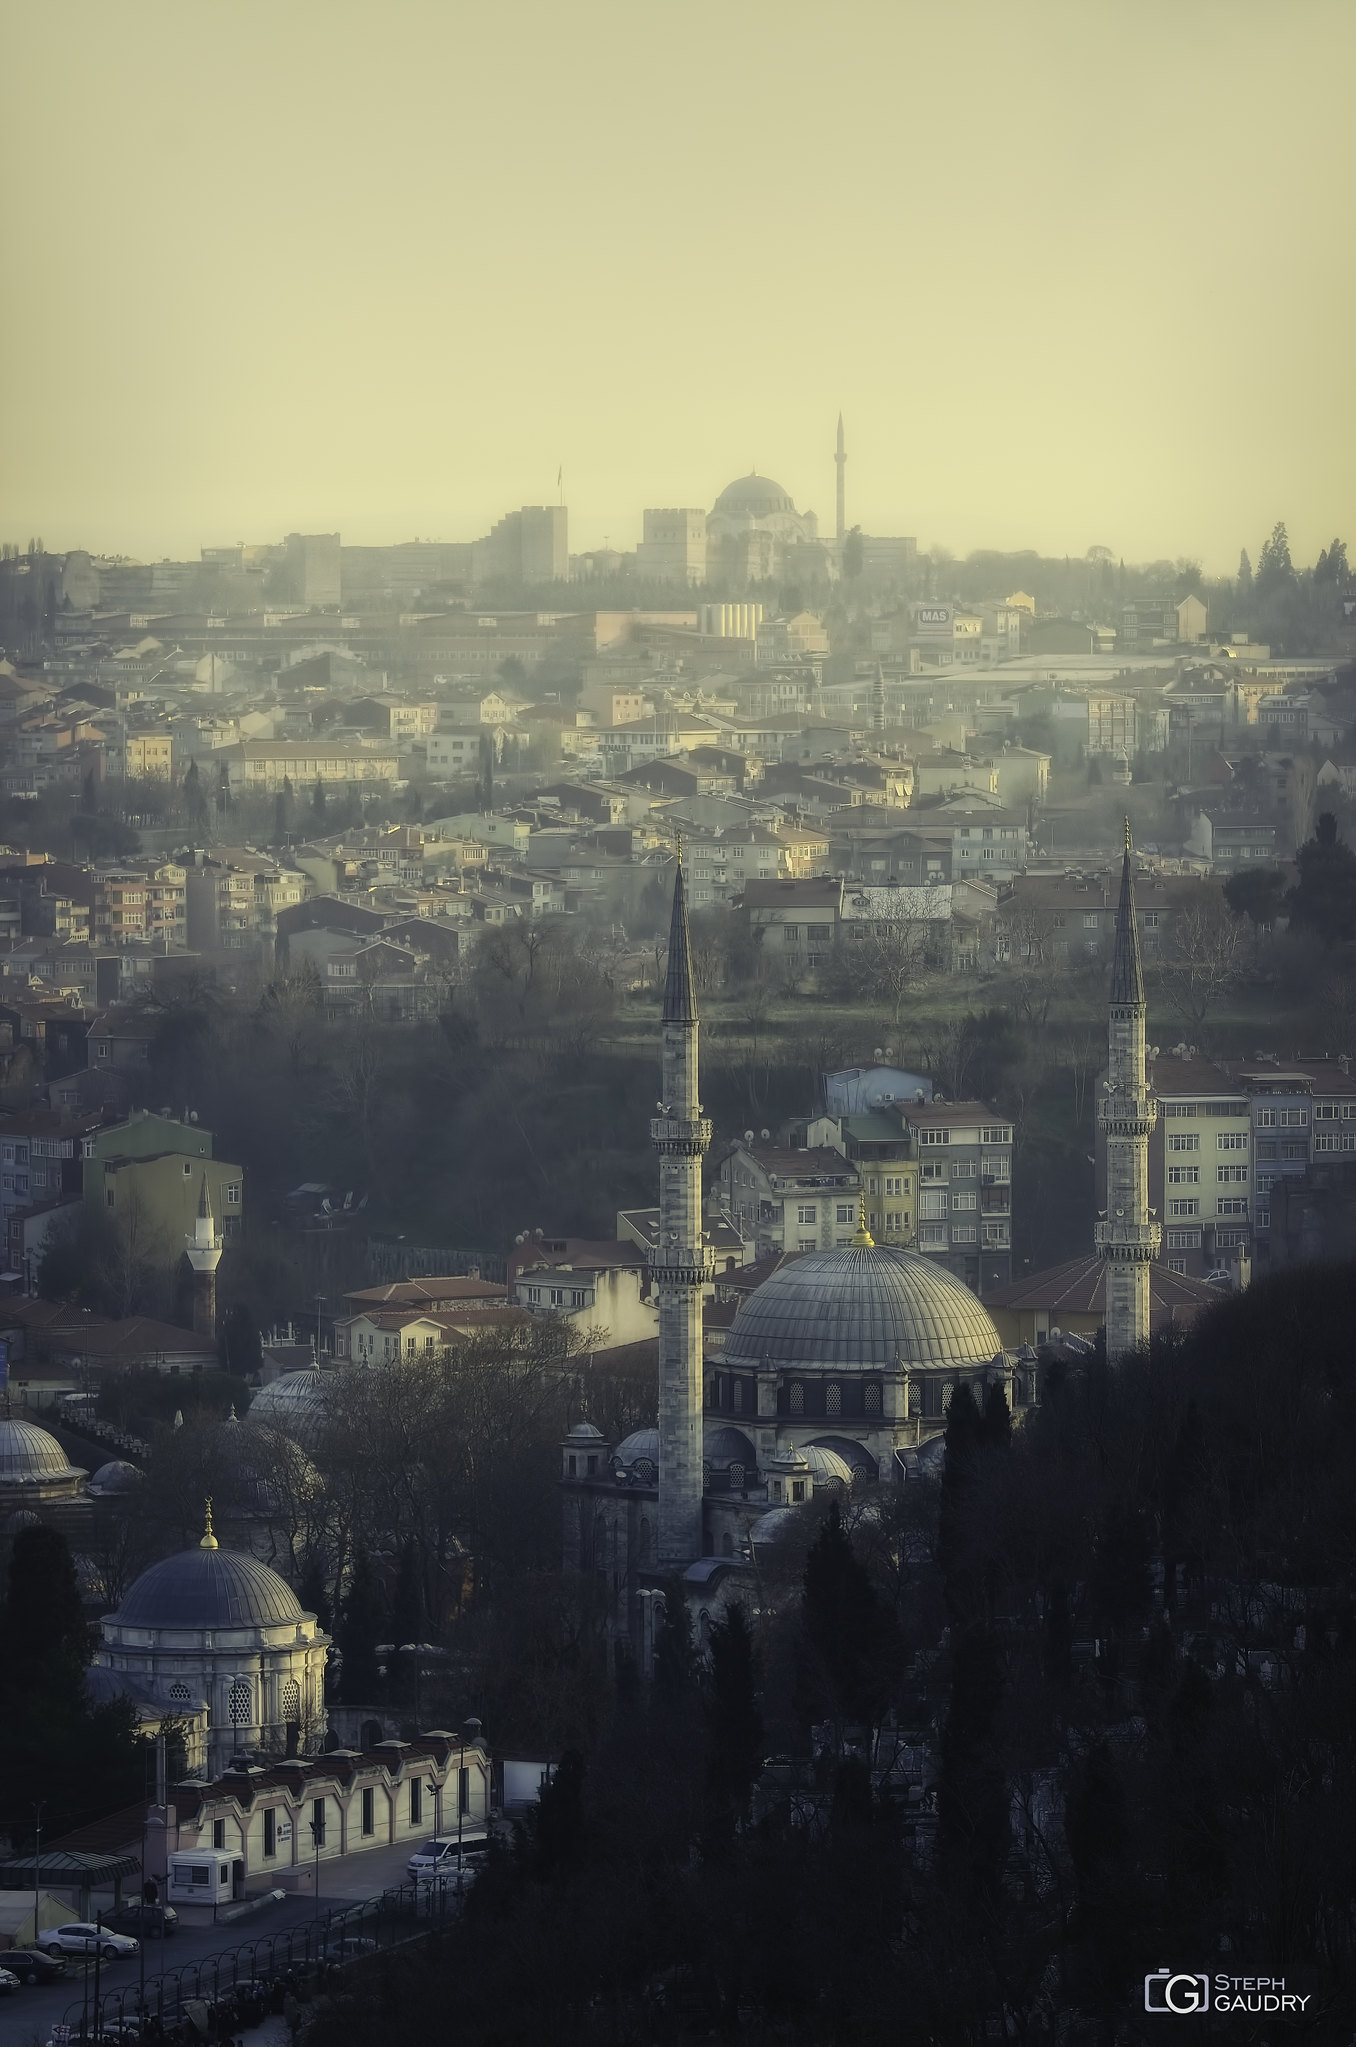 Mosquée d'Eyüp (Eyüp Sultan Camii) – Istanbul [Klik om de diavoorstelling te starten]